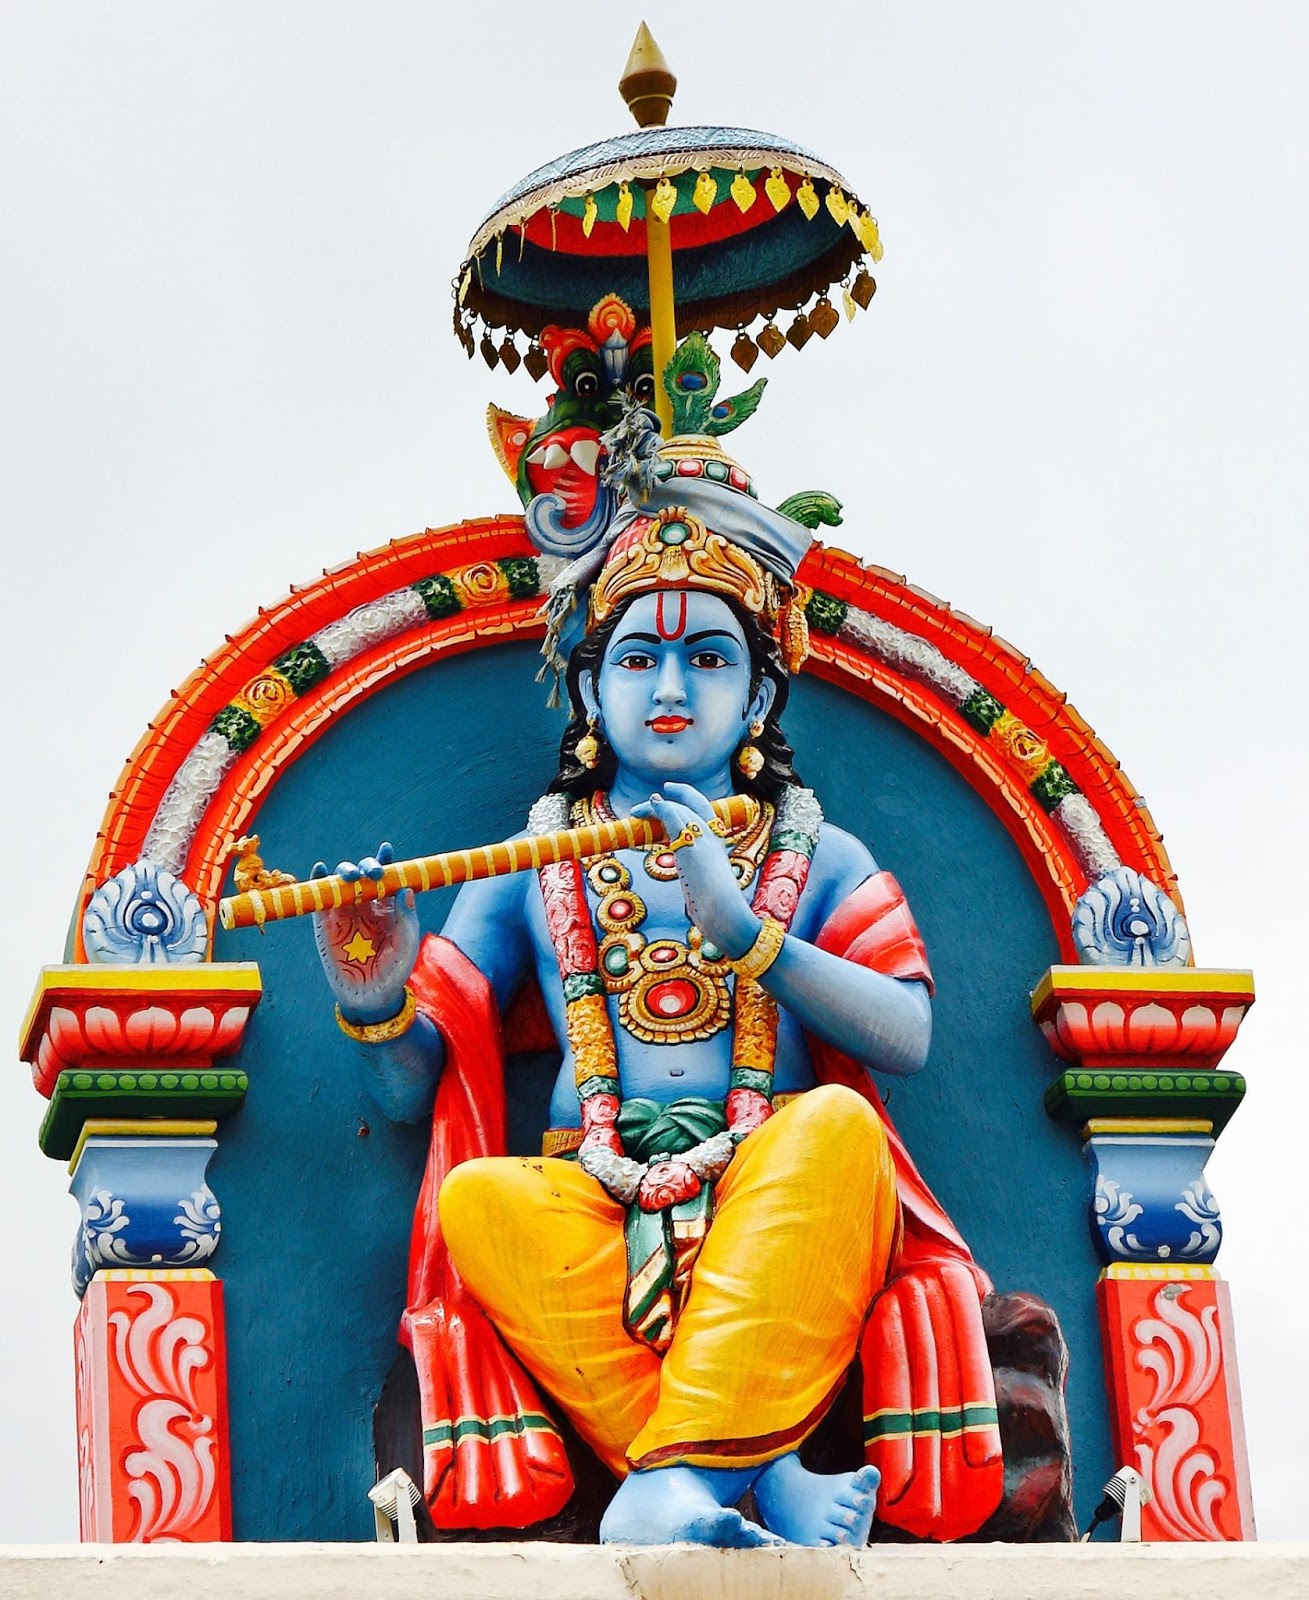 Pothana bhagavatham in telugu